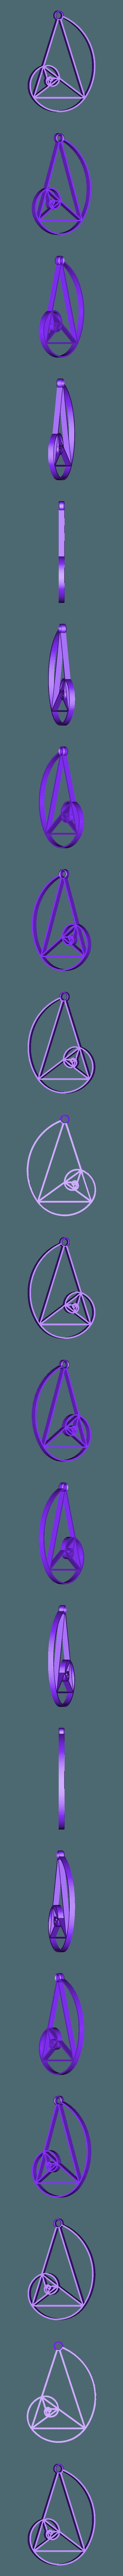 LogaSpiral80mm.stl Download free STL file Logarithmic Spiral, Golden Triangle, Golden Gnomon, Spira Mirabilis • 3D print object, LGBU